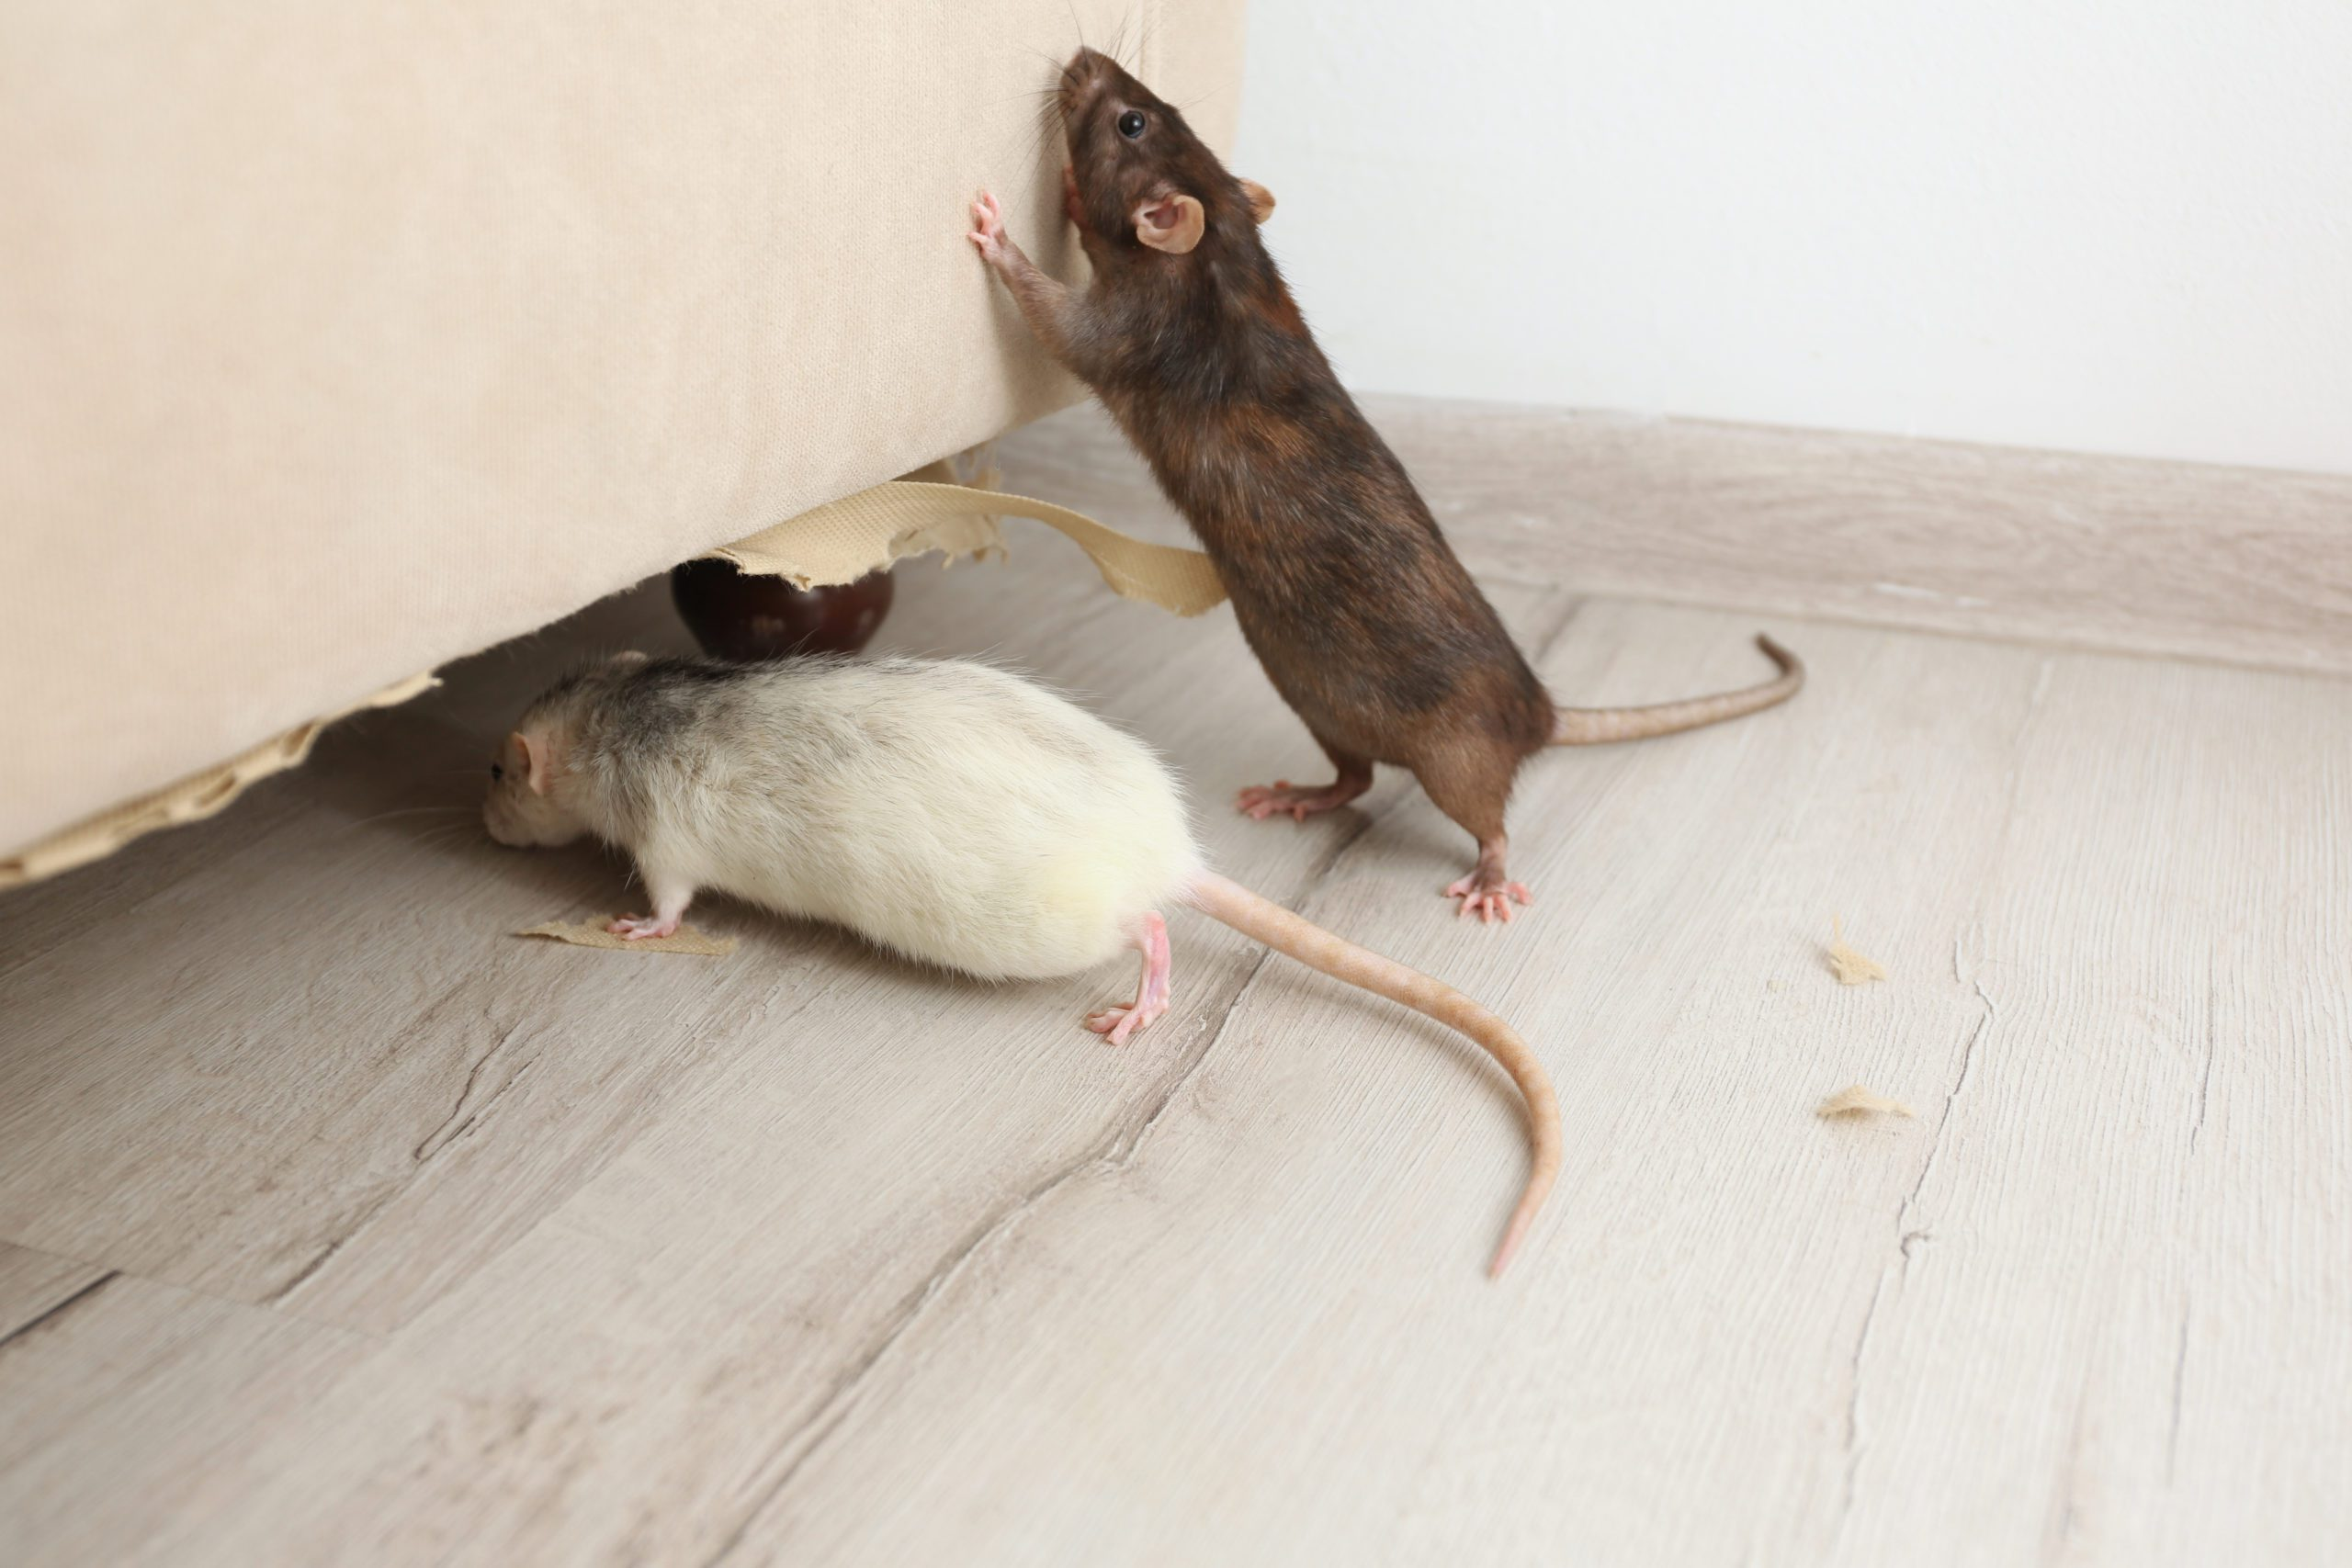 Apartment Rat Infestation